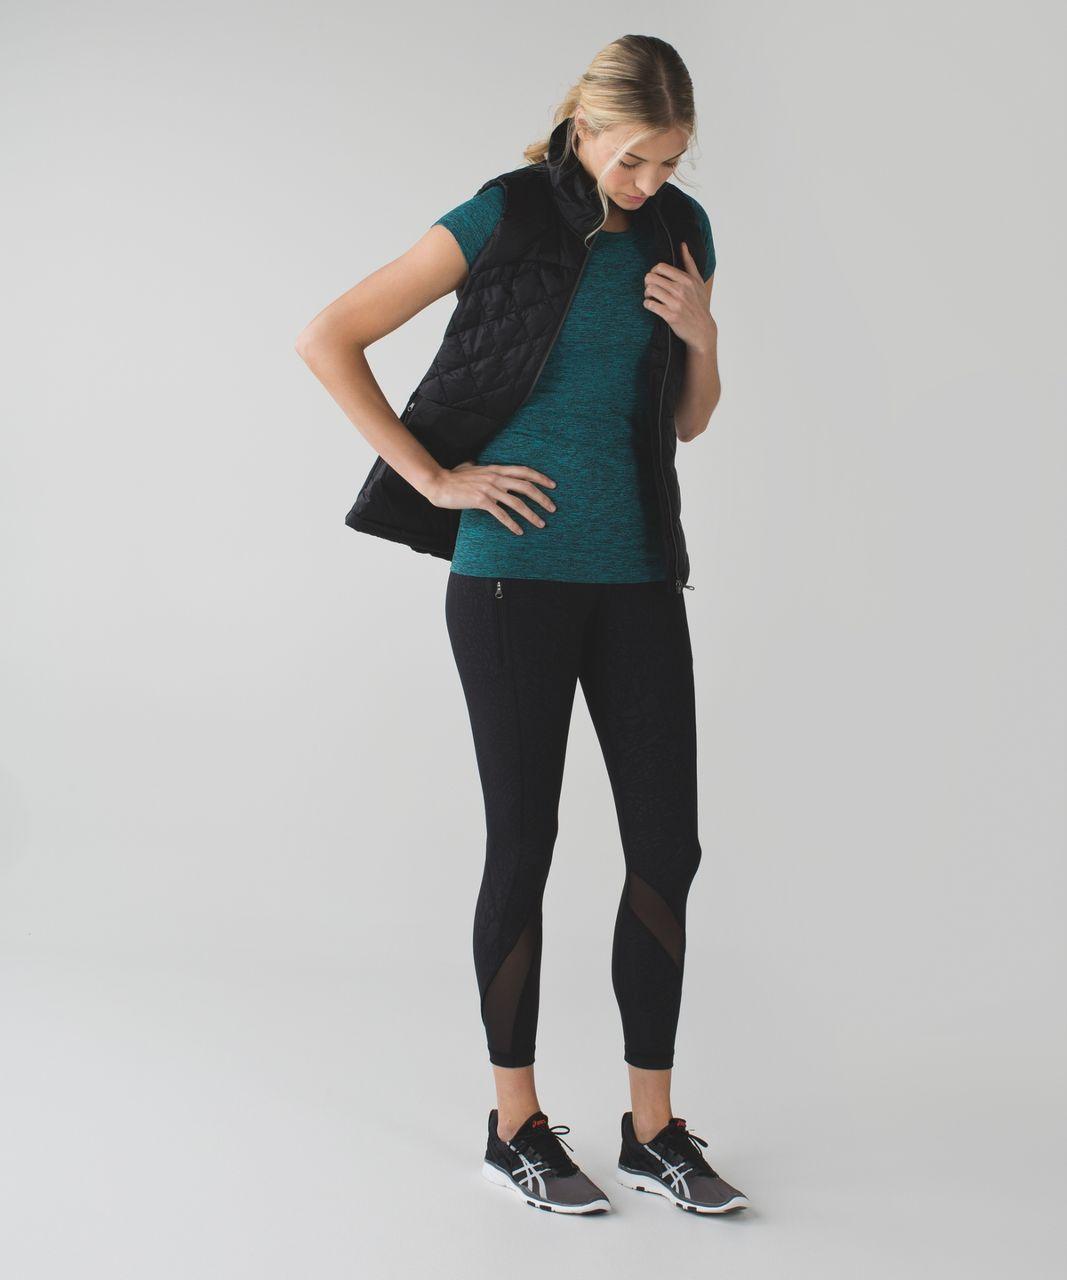 Lululemon Swiftly Tech Short Sleeve Crew - Heathered Peacock